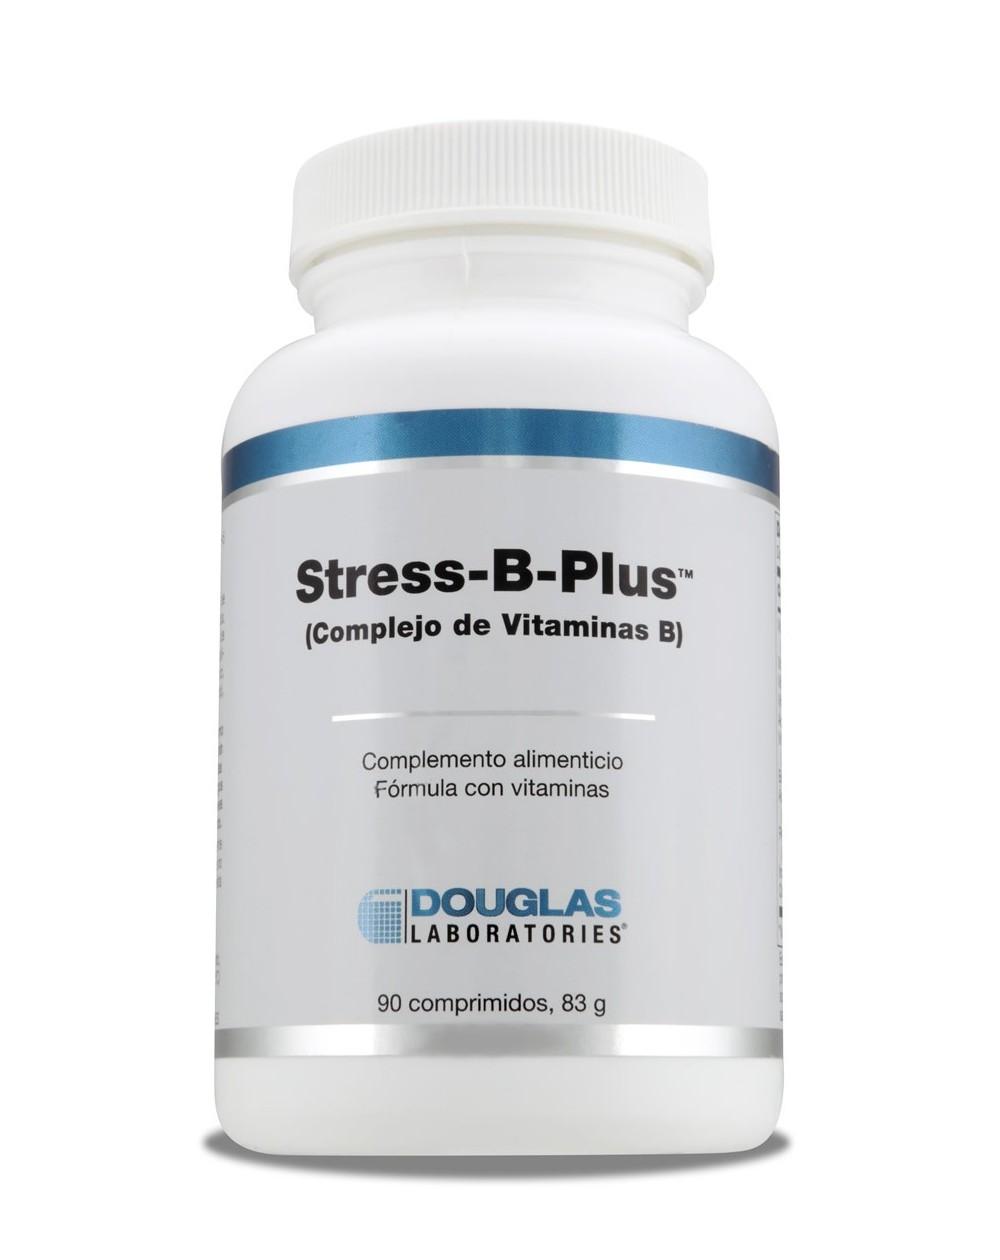 Stress-B-Plus